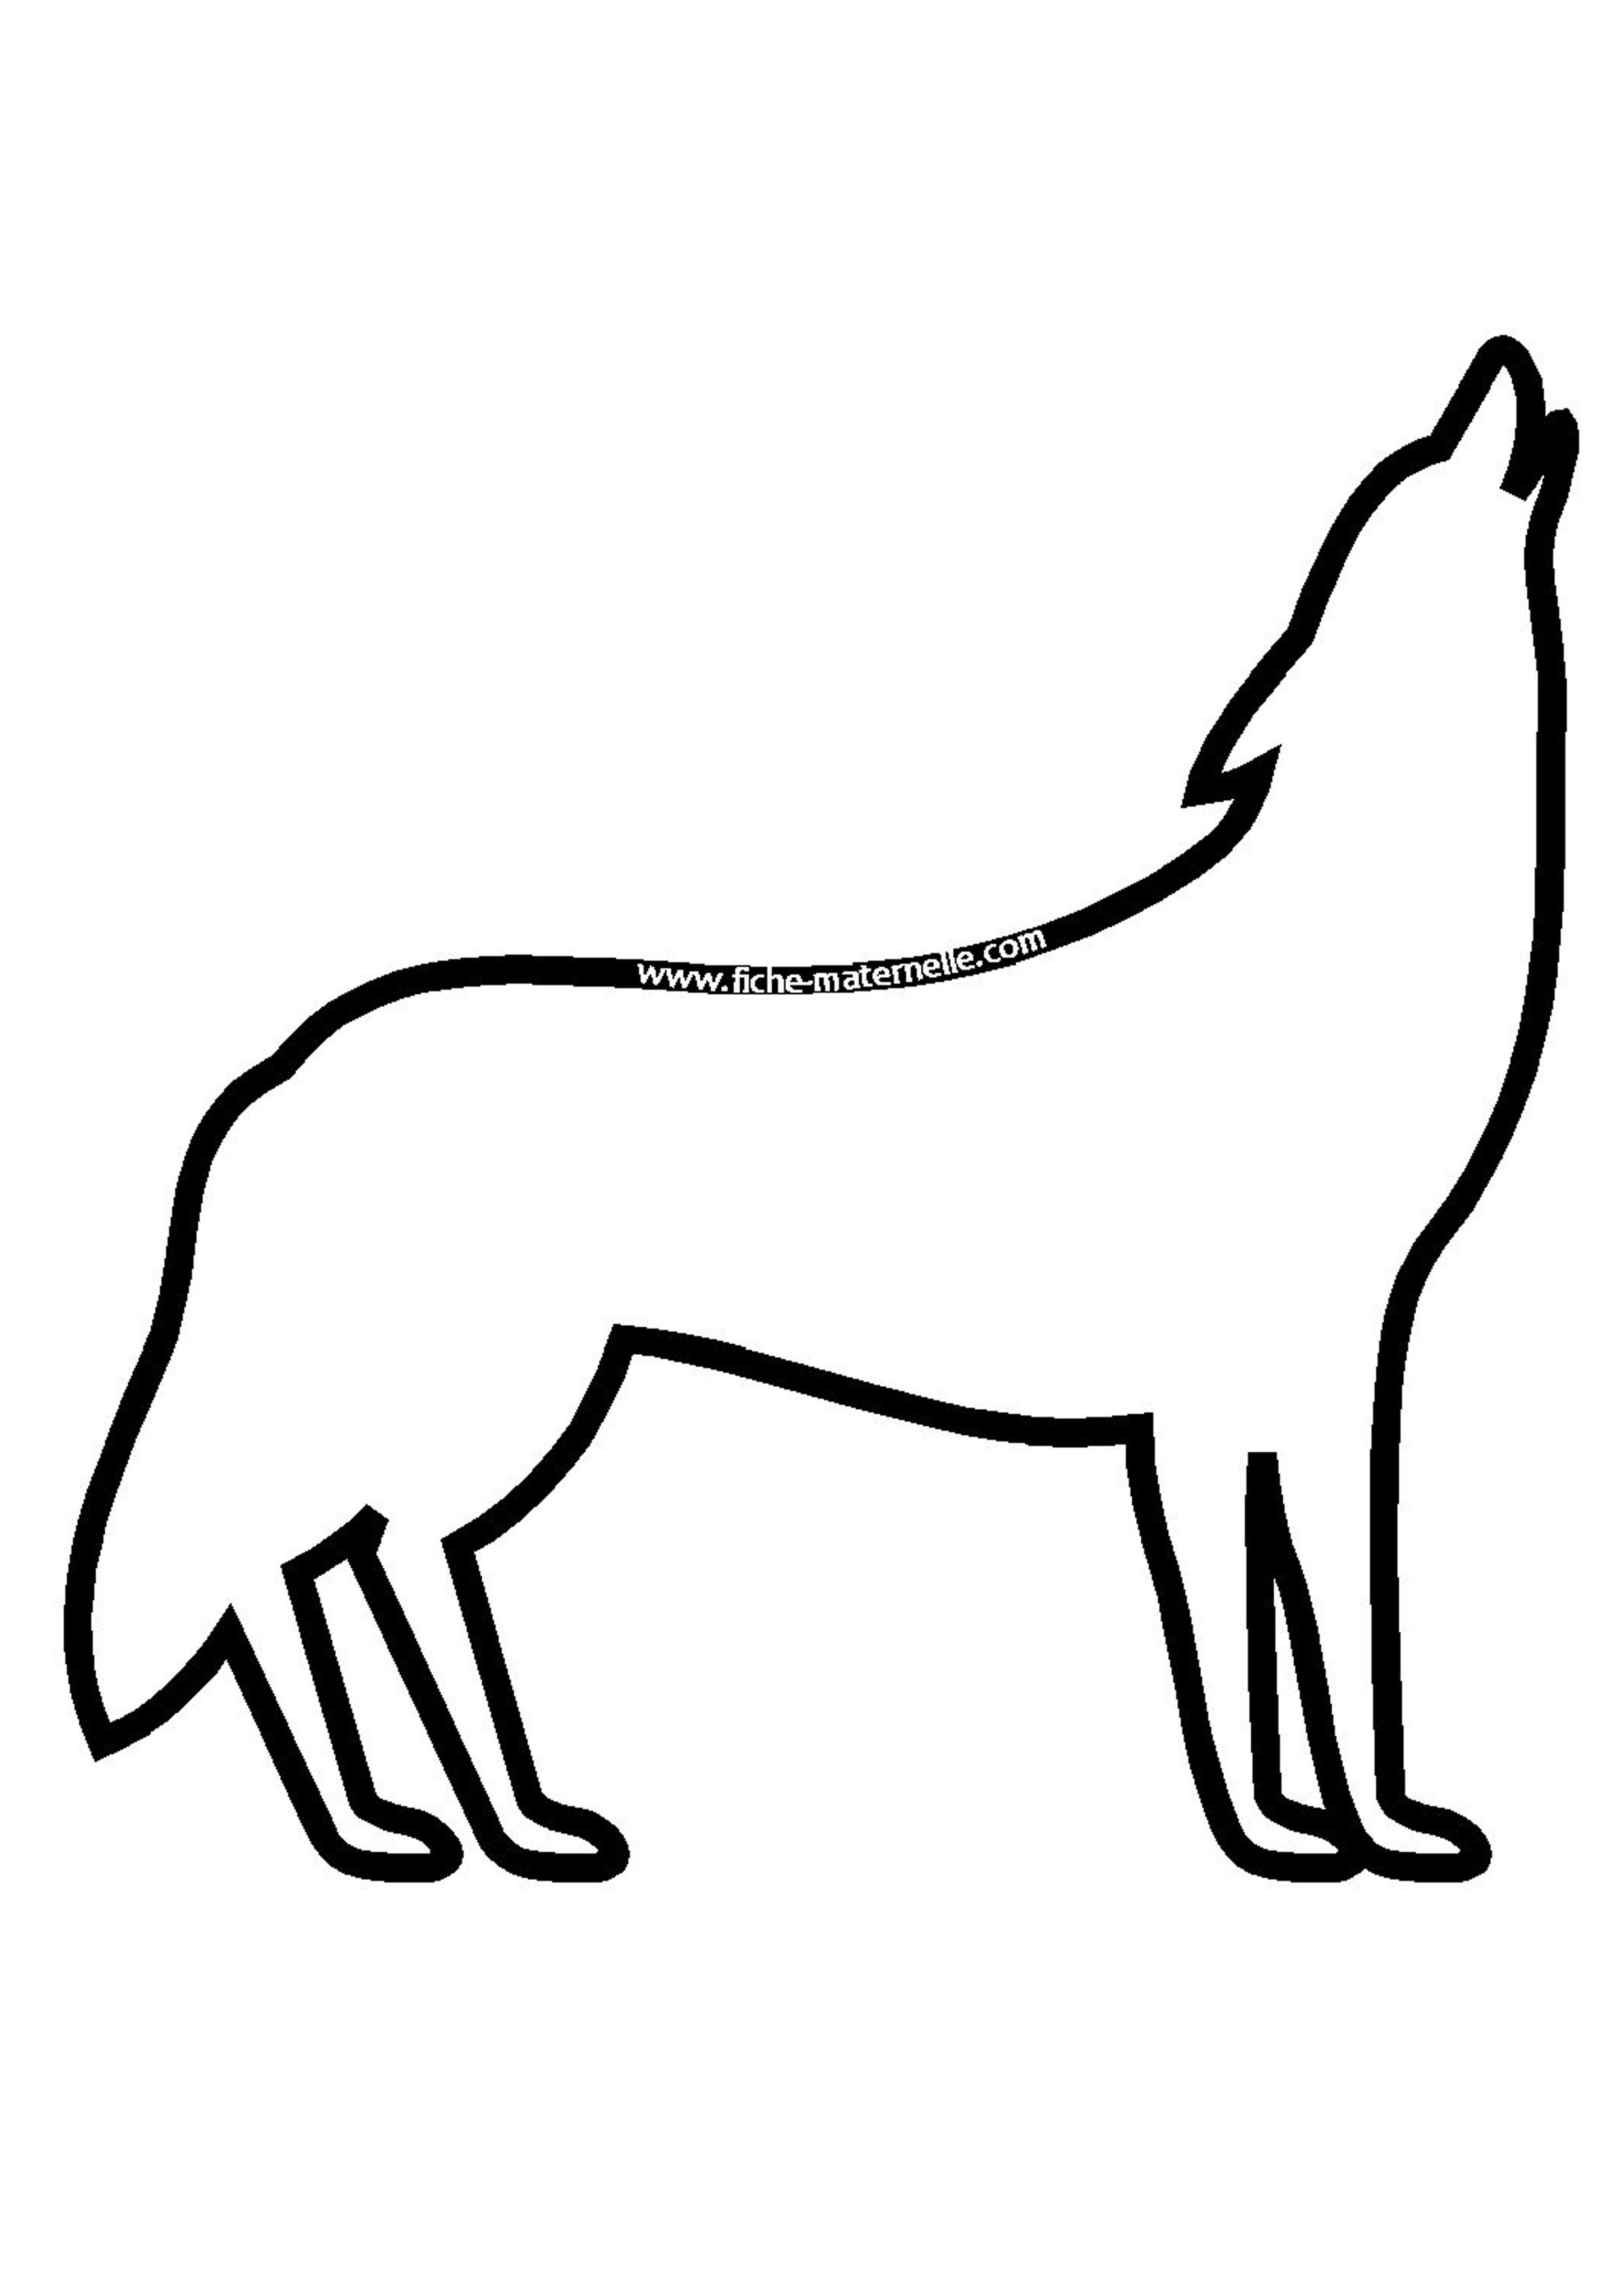 dessin simple loup